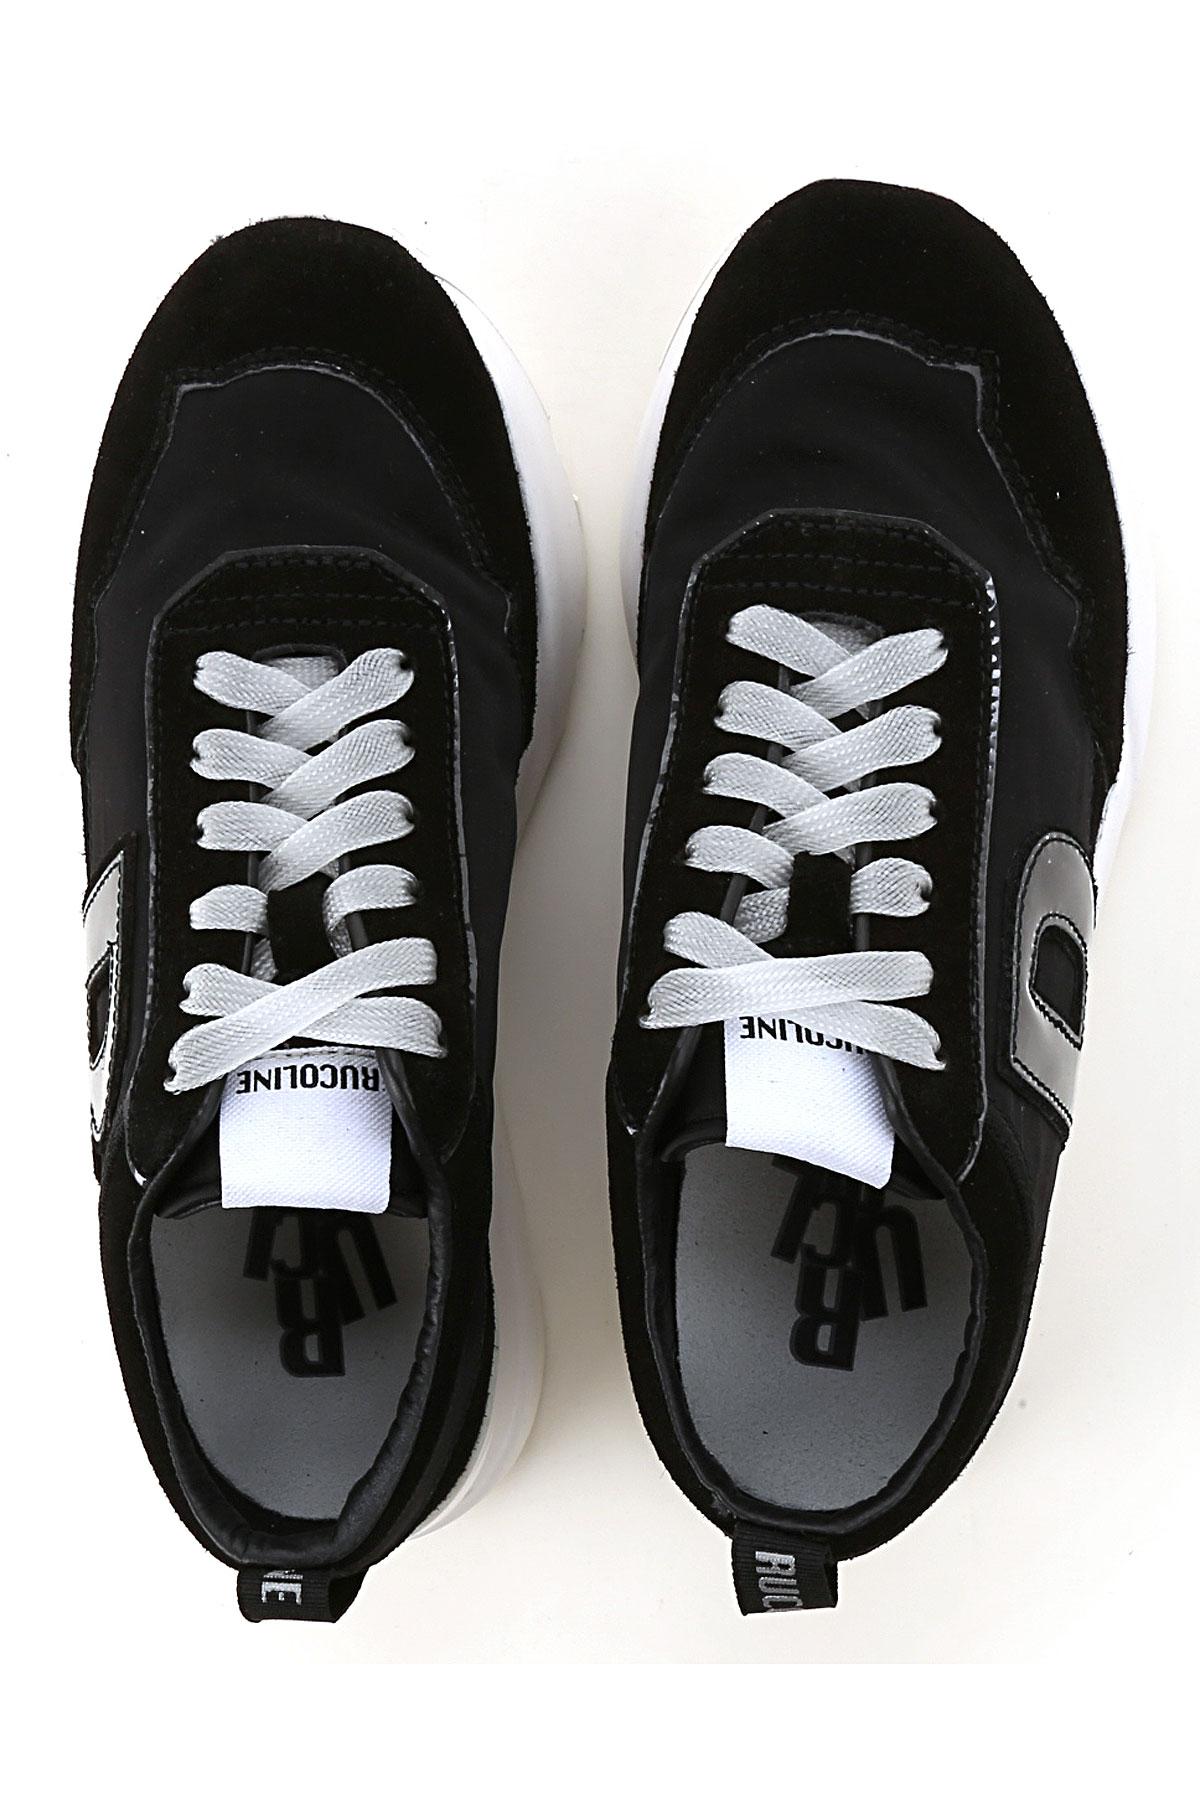 2019 nbsp; Ruco Primavera Line Zapatos Para Negro verano Mujer w8pYqwR